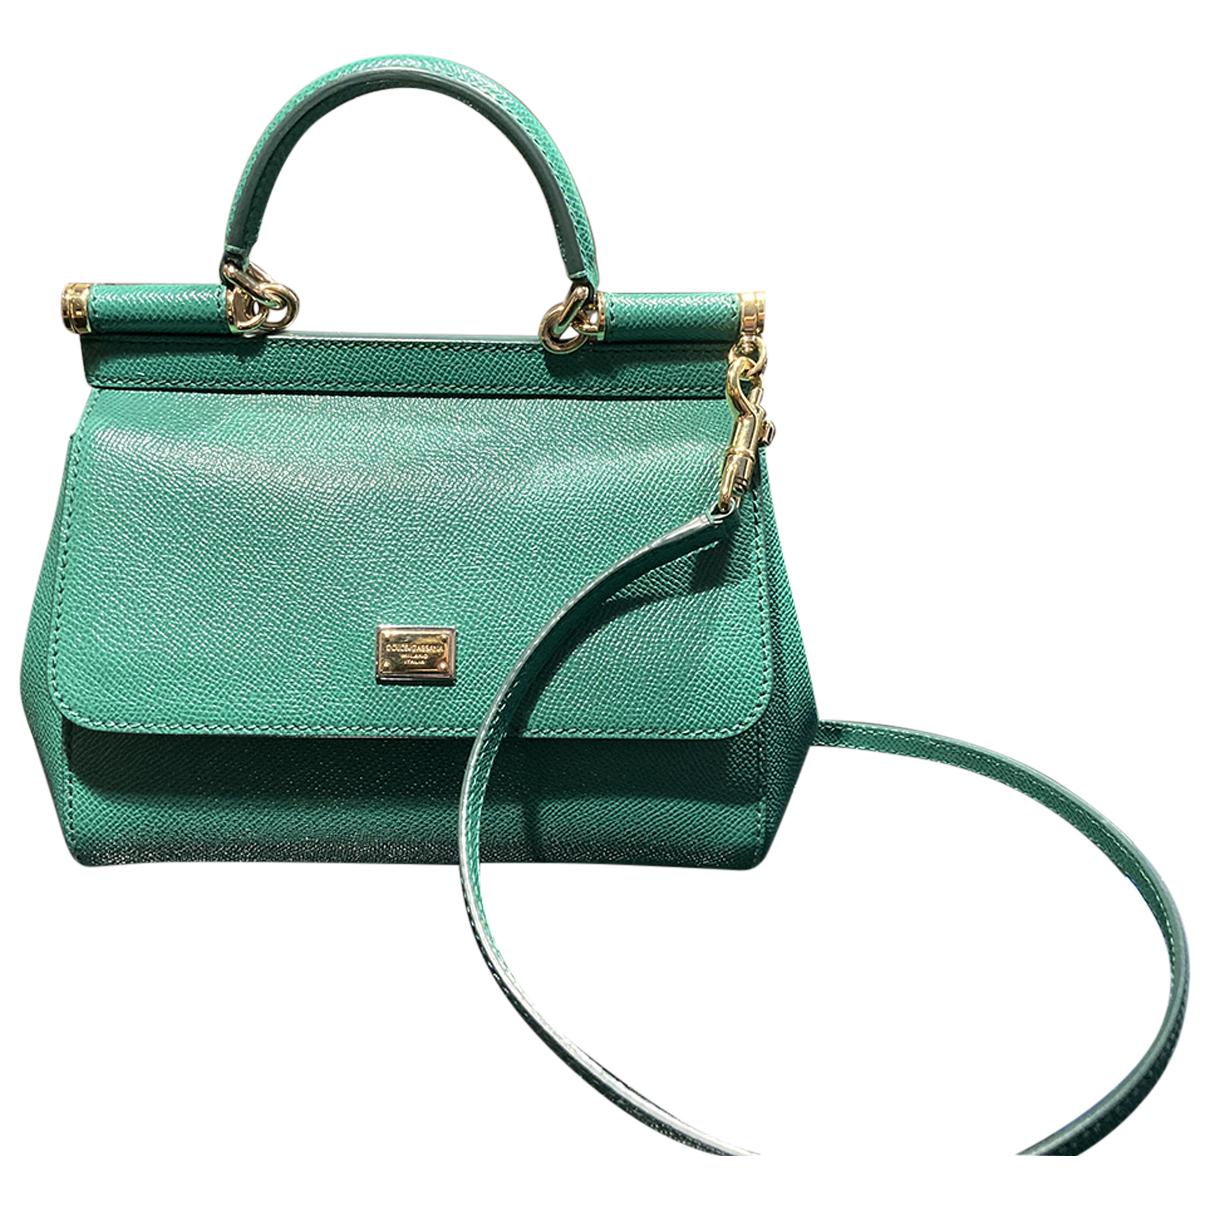 Dolce & Gabbana - Sac a main Sicily pour femme en cuir - vert